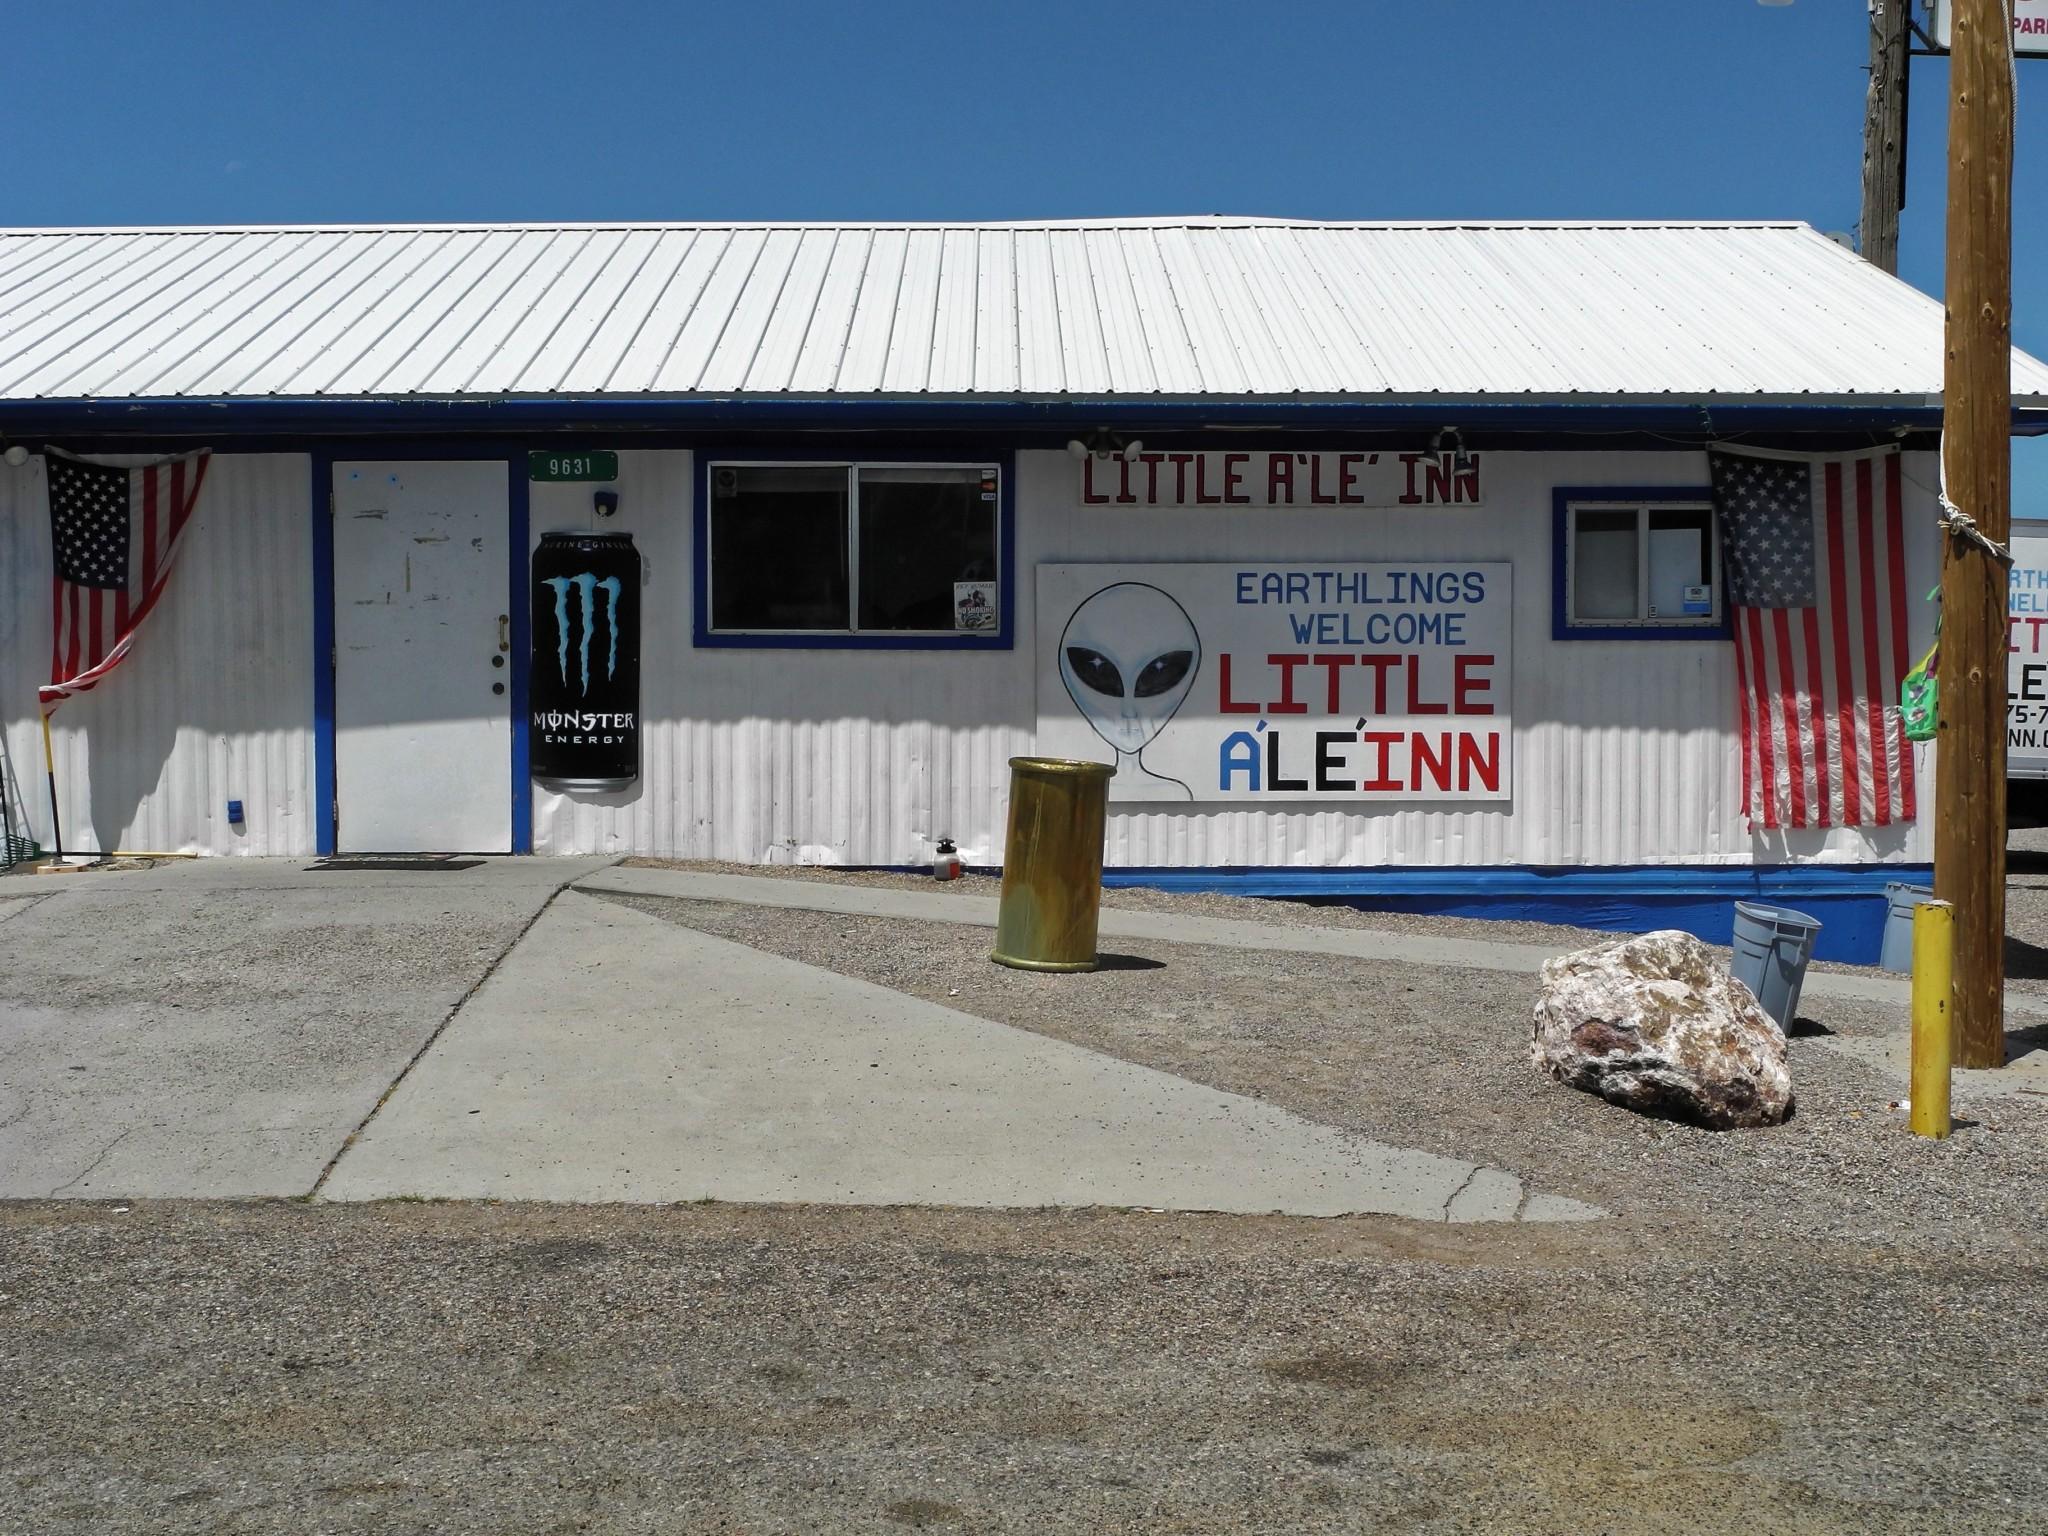 Little Ale Inn - Area 51